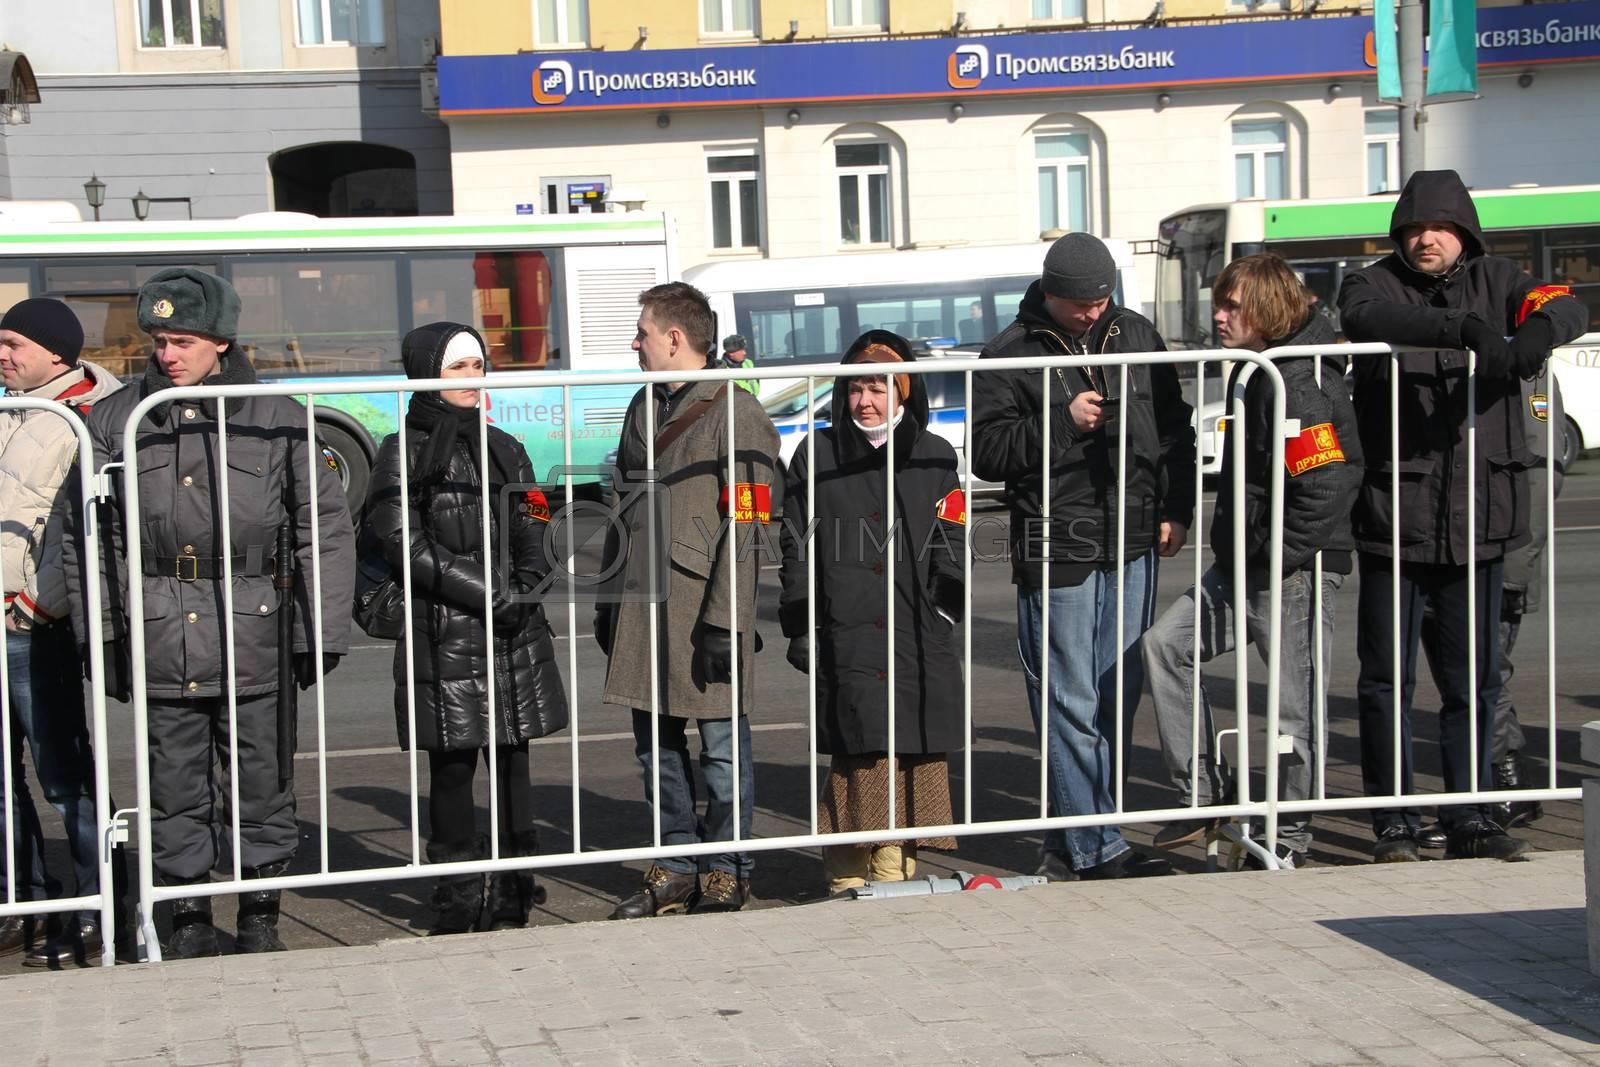 Vigilantes in the cordon around the opposition rally by olegkozyrev